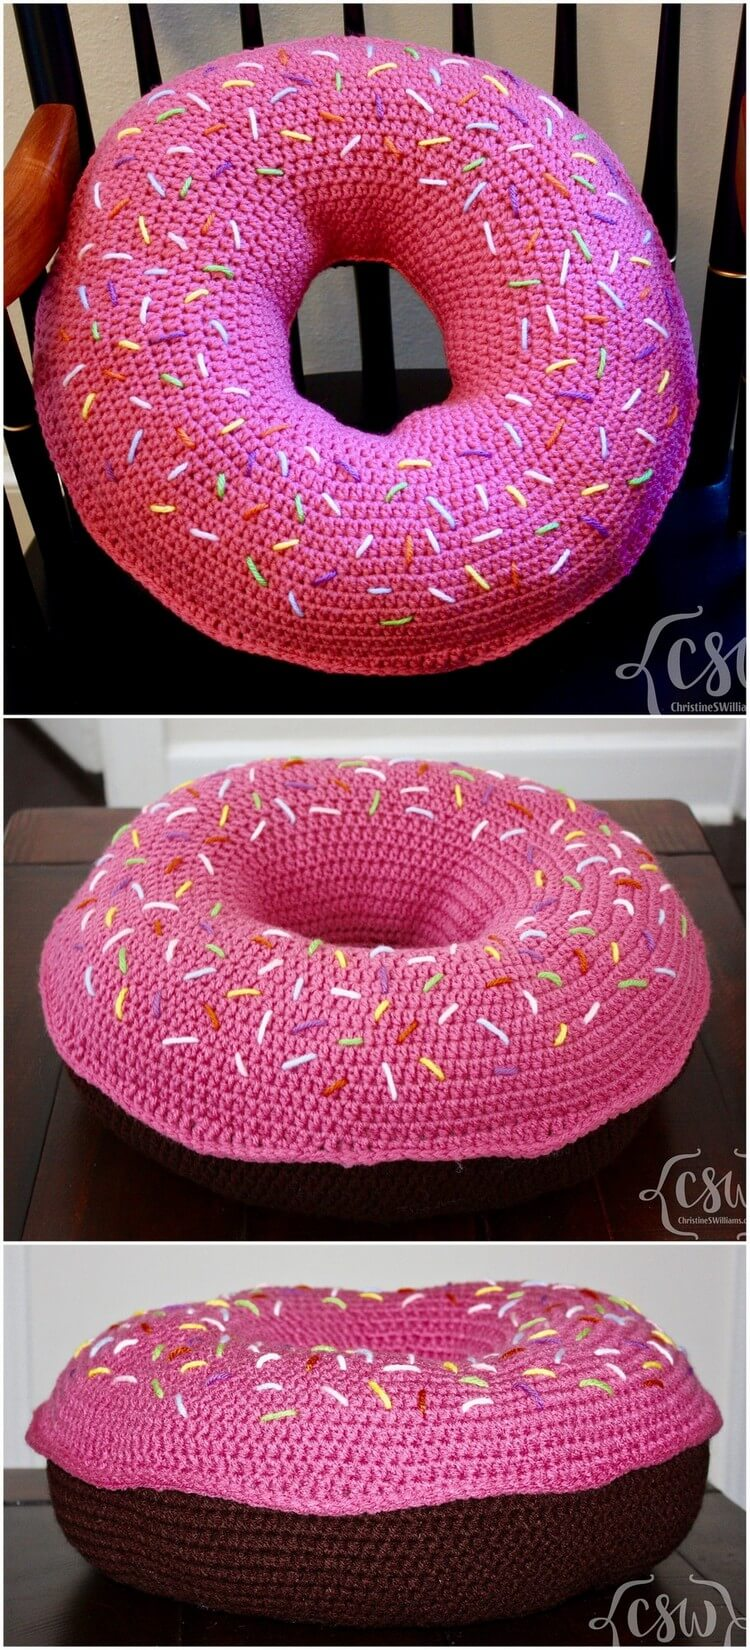 Crochet Pillow Free Pattern (6)